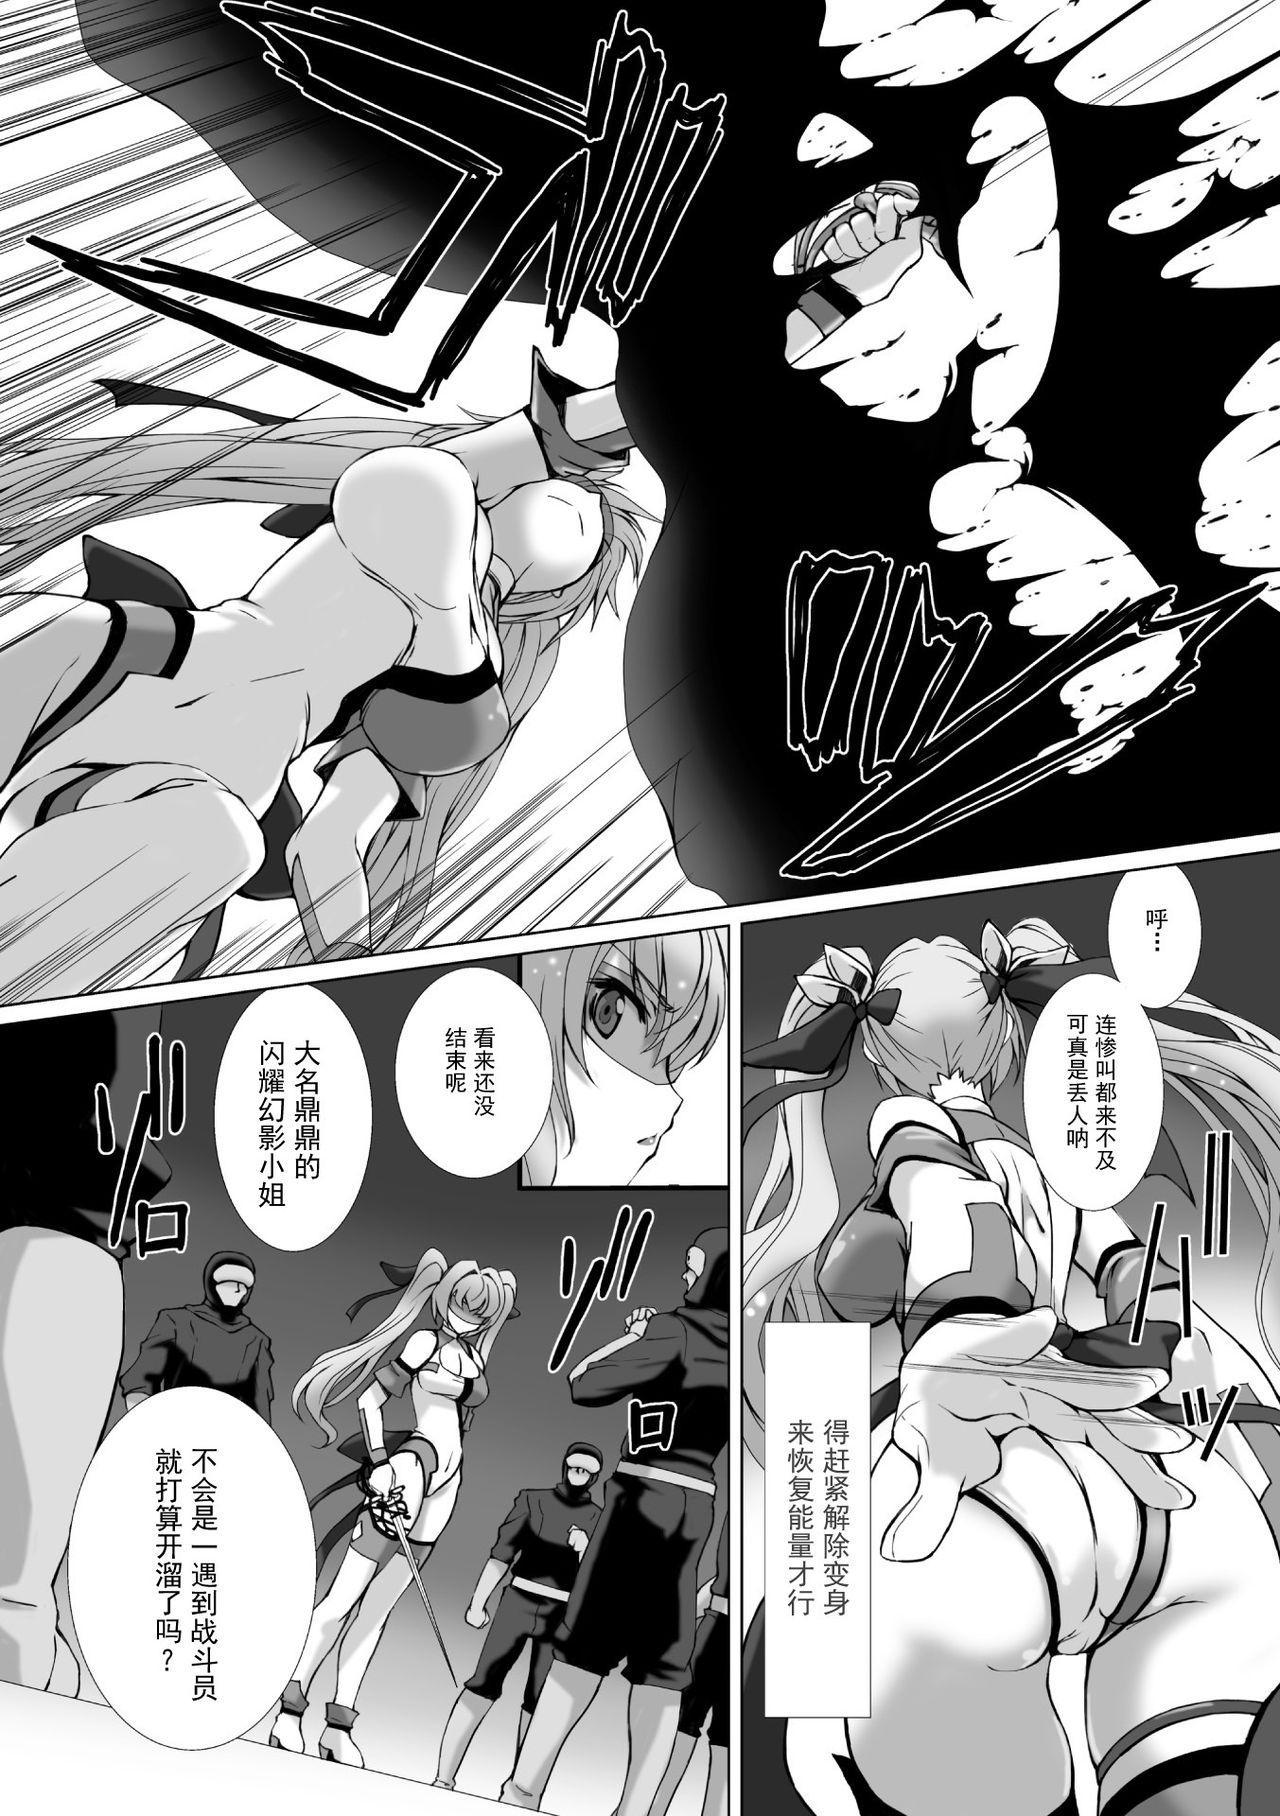 Hengen Souki Shine Mirage THE COMIC EPISODE 1-5 5